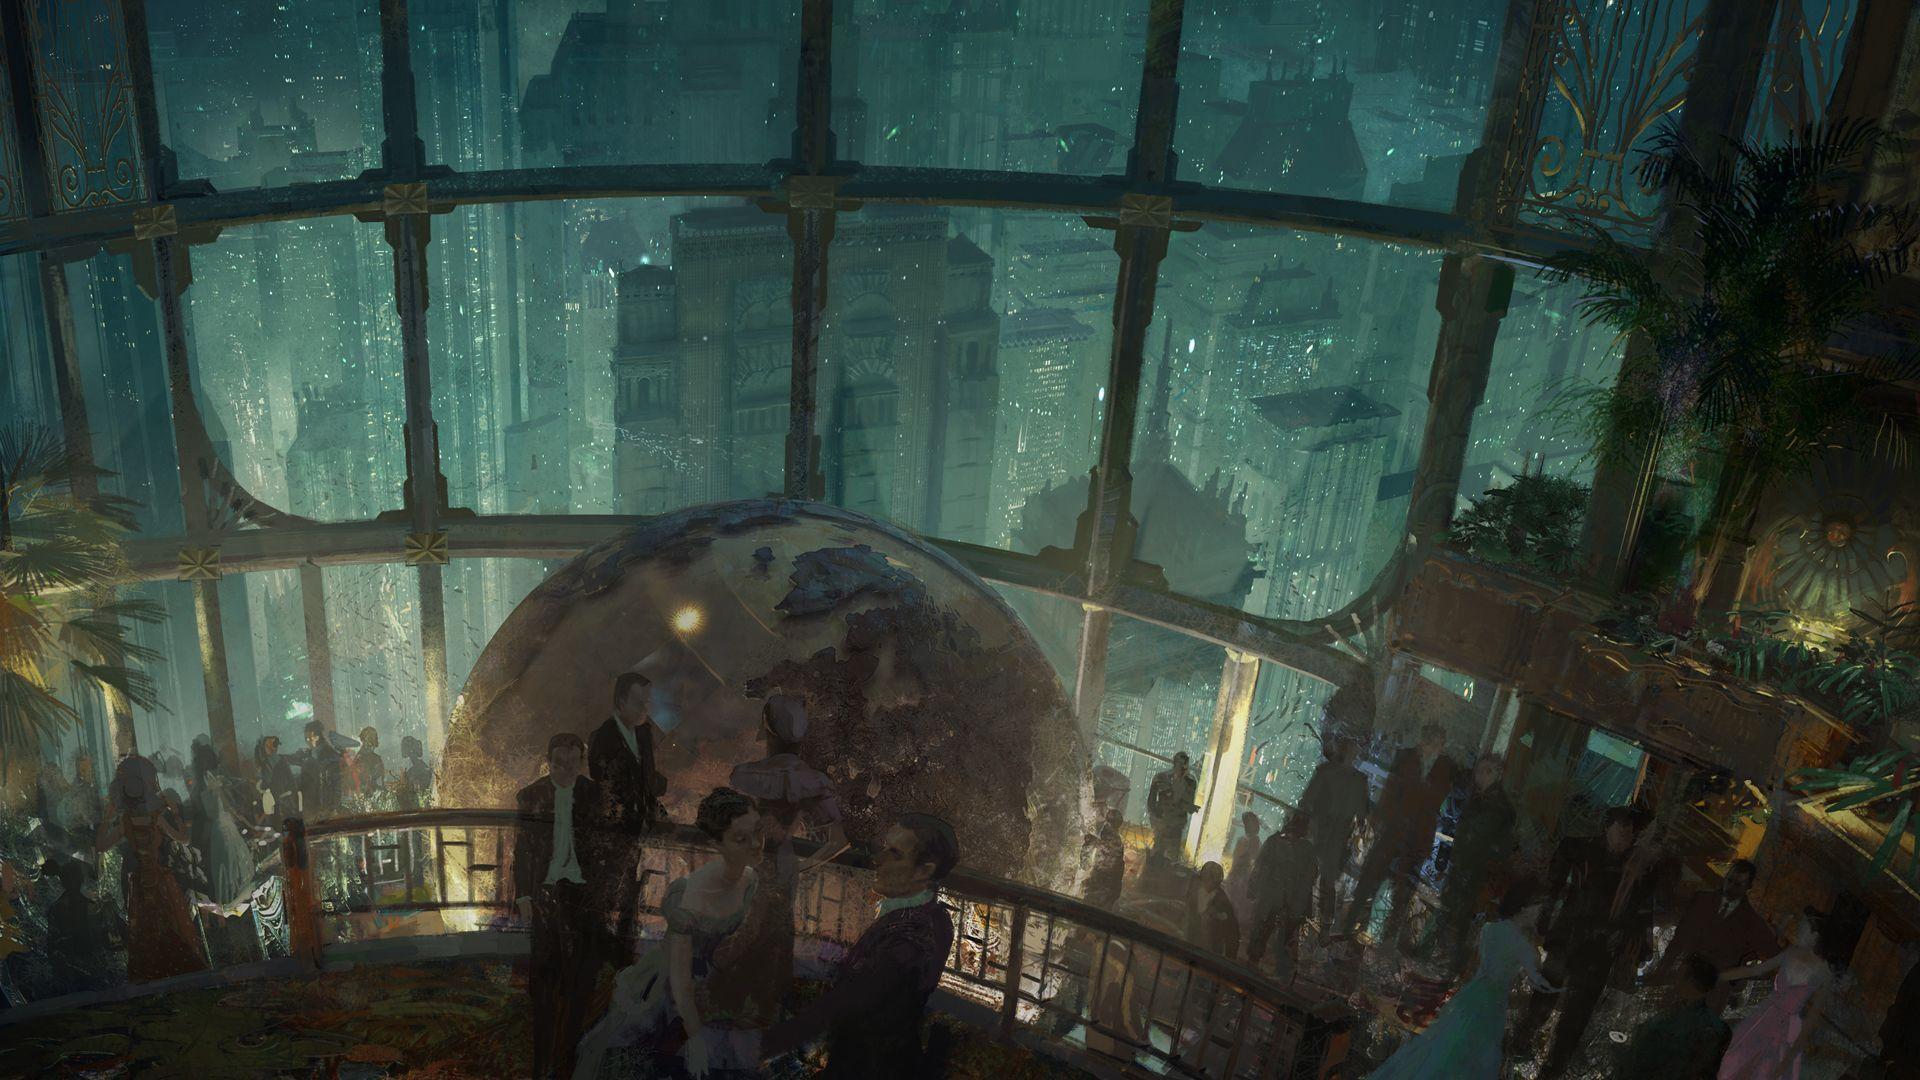 bioshock rapture city wallpaper the